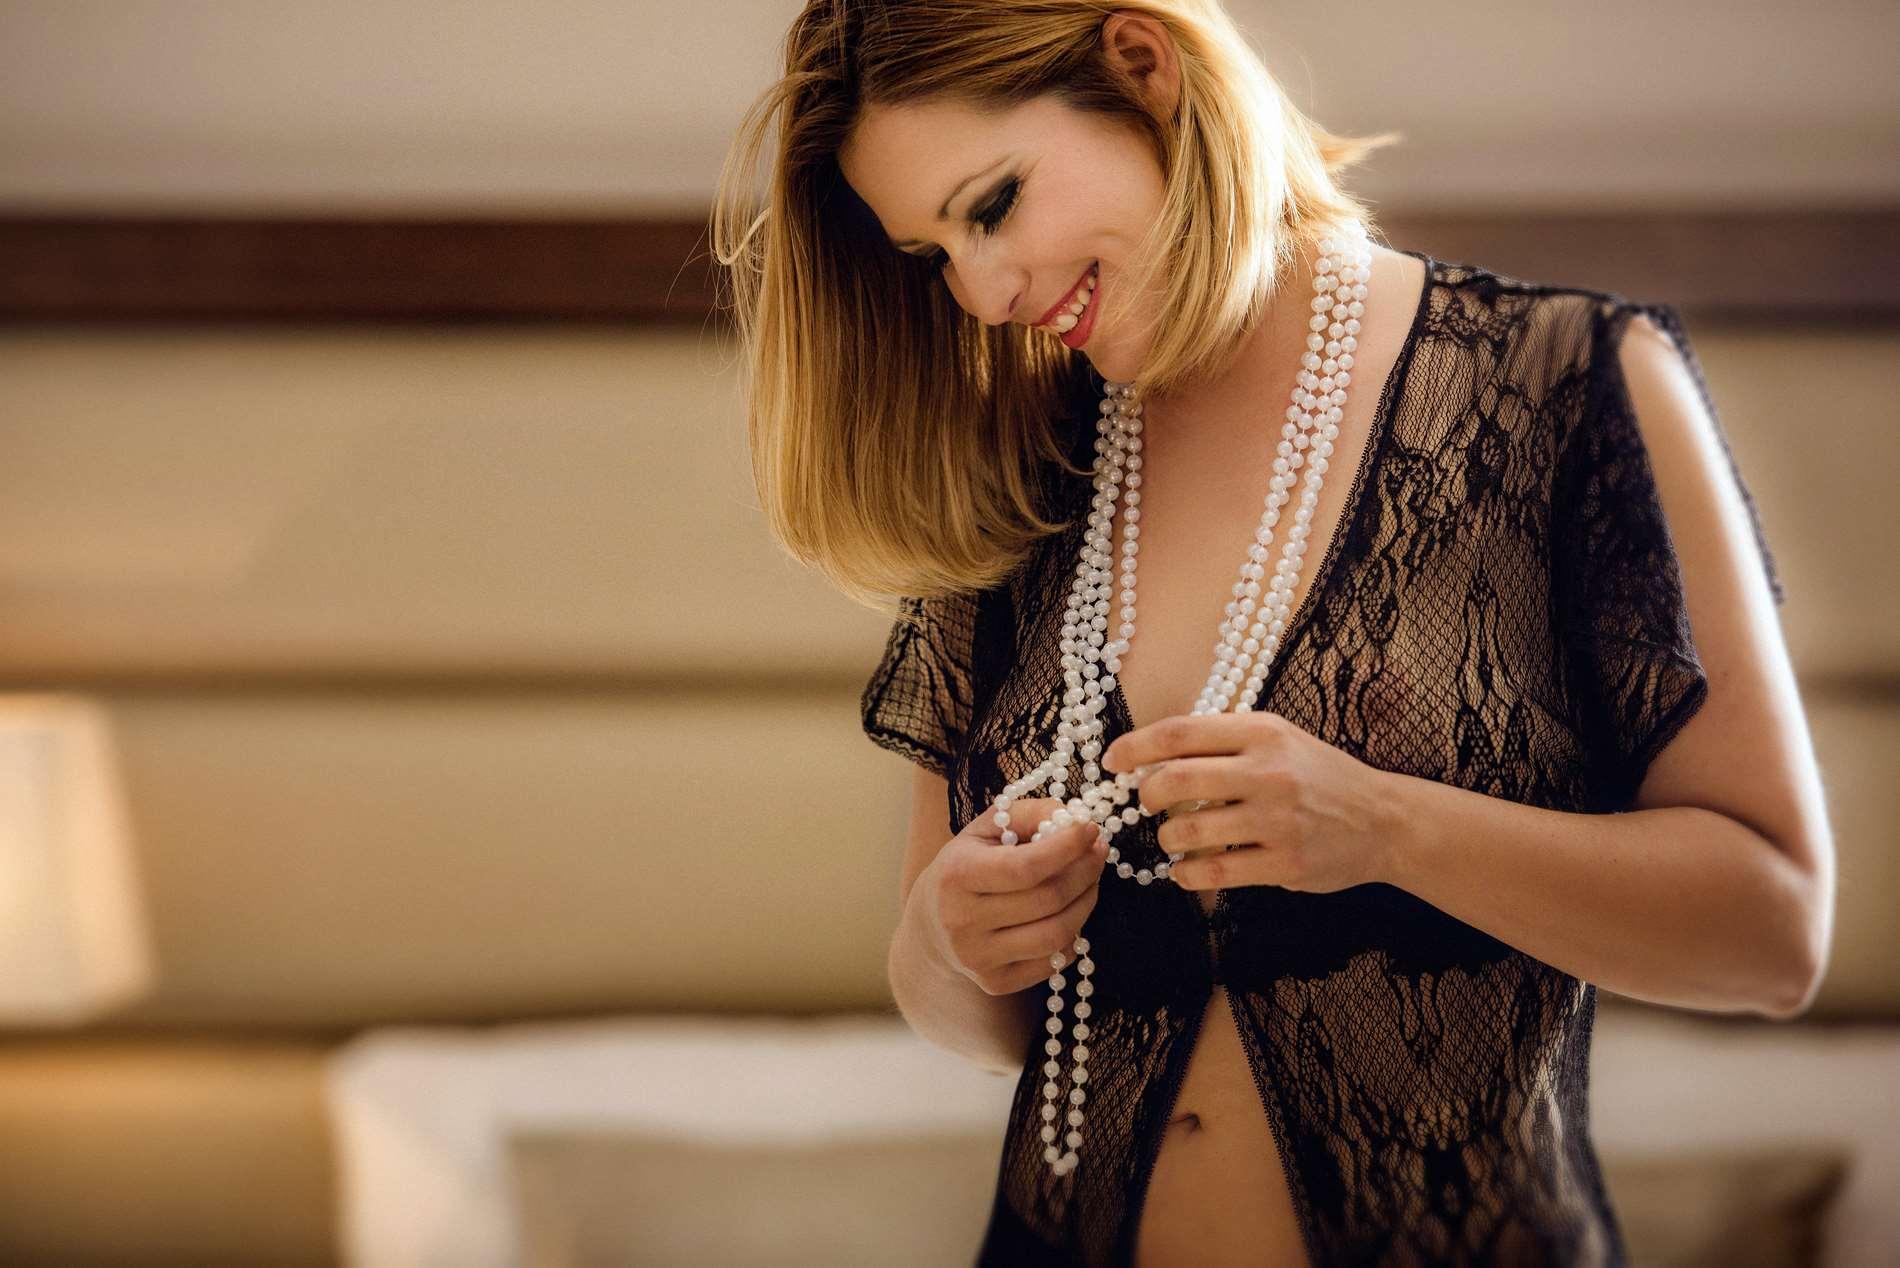 Fotografía Boudoir - Sesión de Fotos sensuales